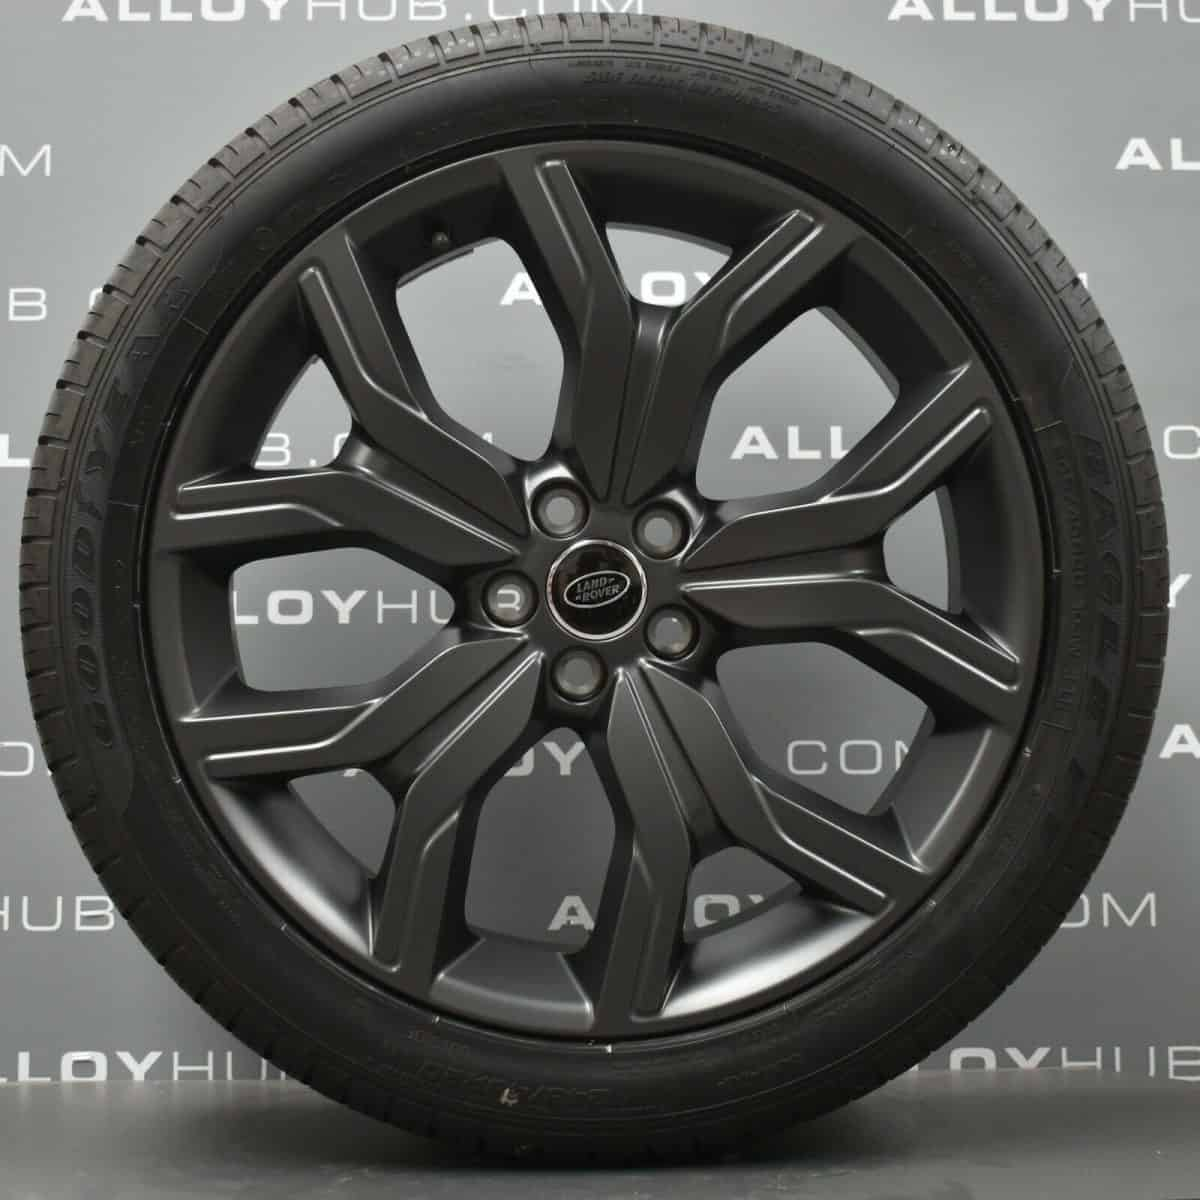 "Genuine Range Rover Evoque L538 20"" inch Style 527 5 Split-Spoke Satin Grey Alloy Wheels EJ3M1007BB"